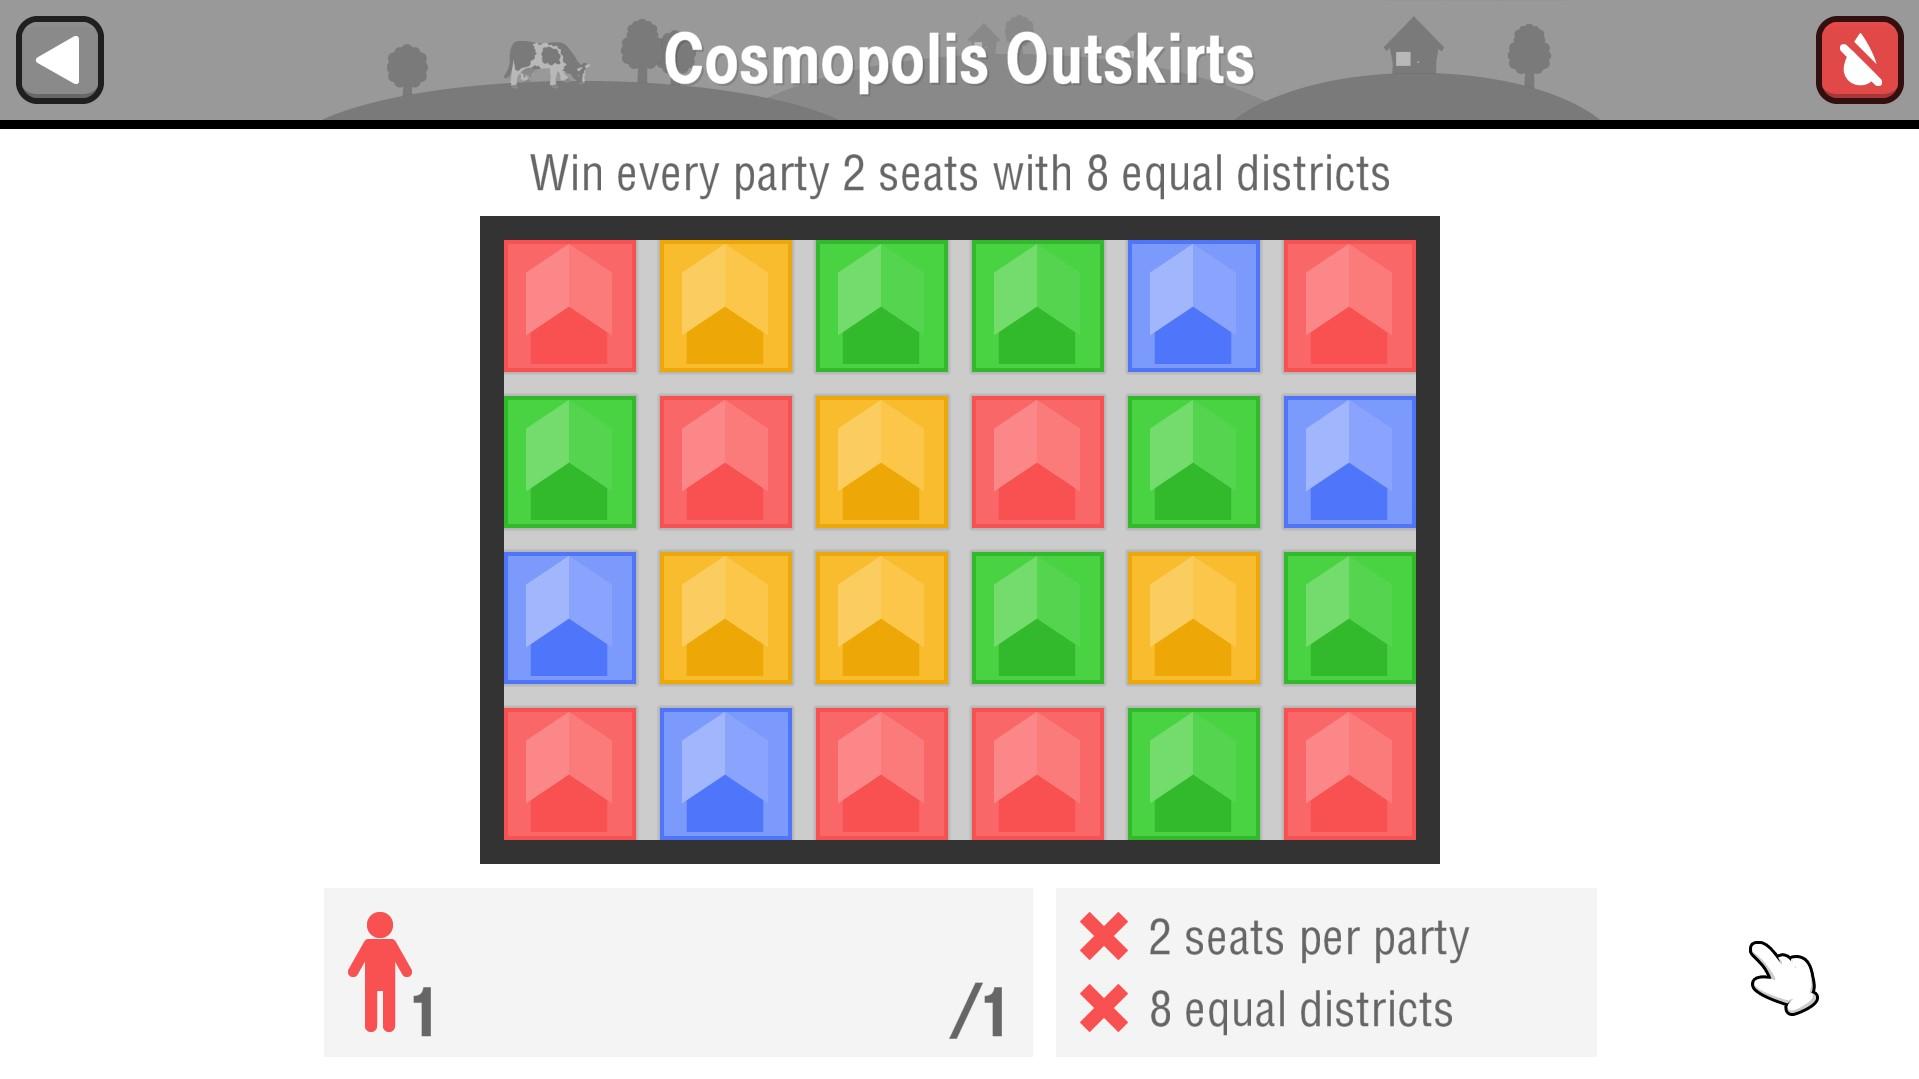 Cosmopolis Outskirts